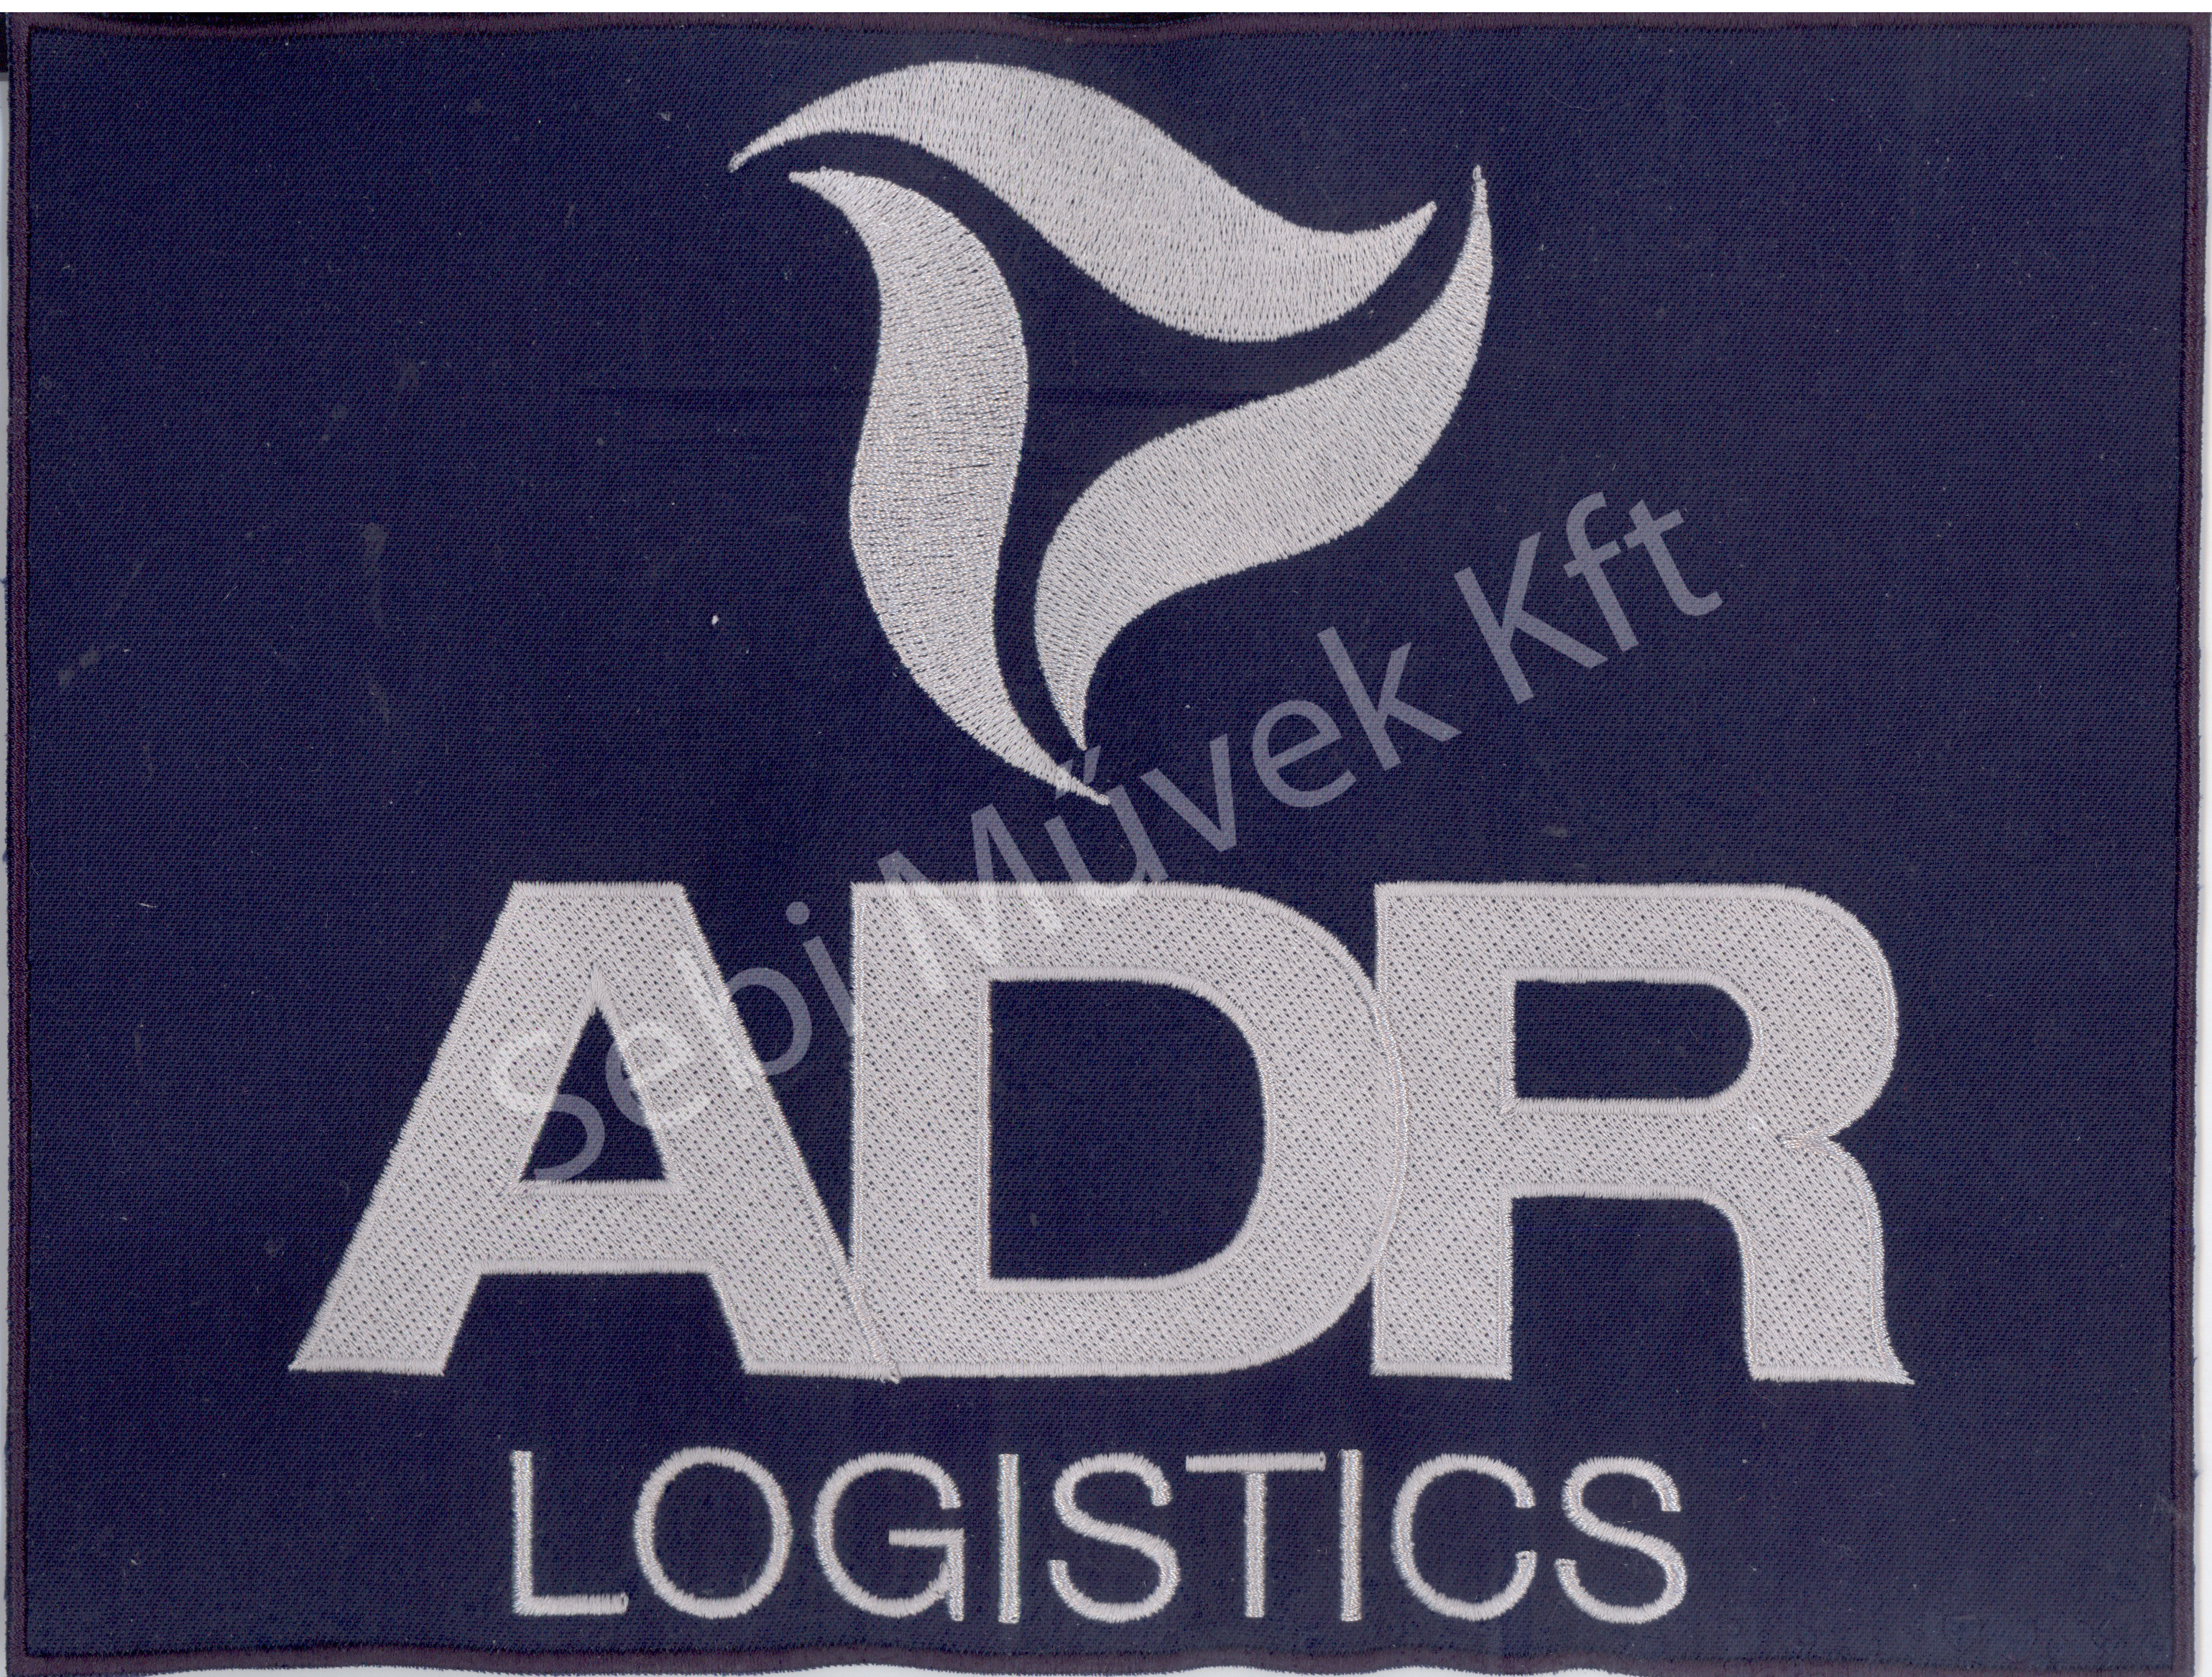 ADR Logistics